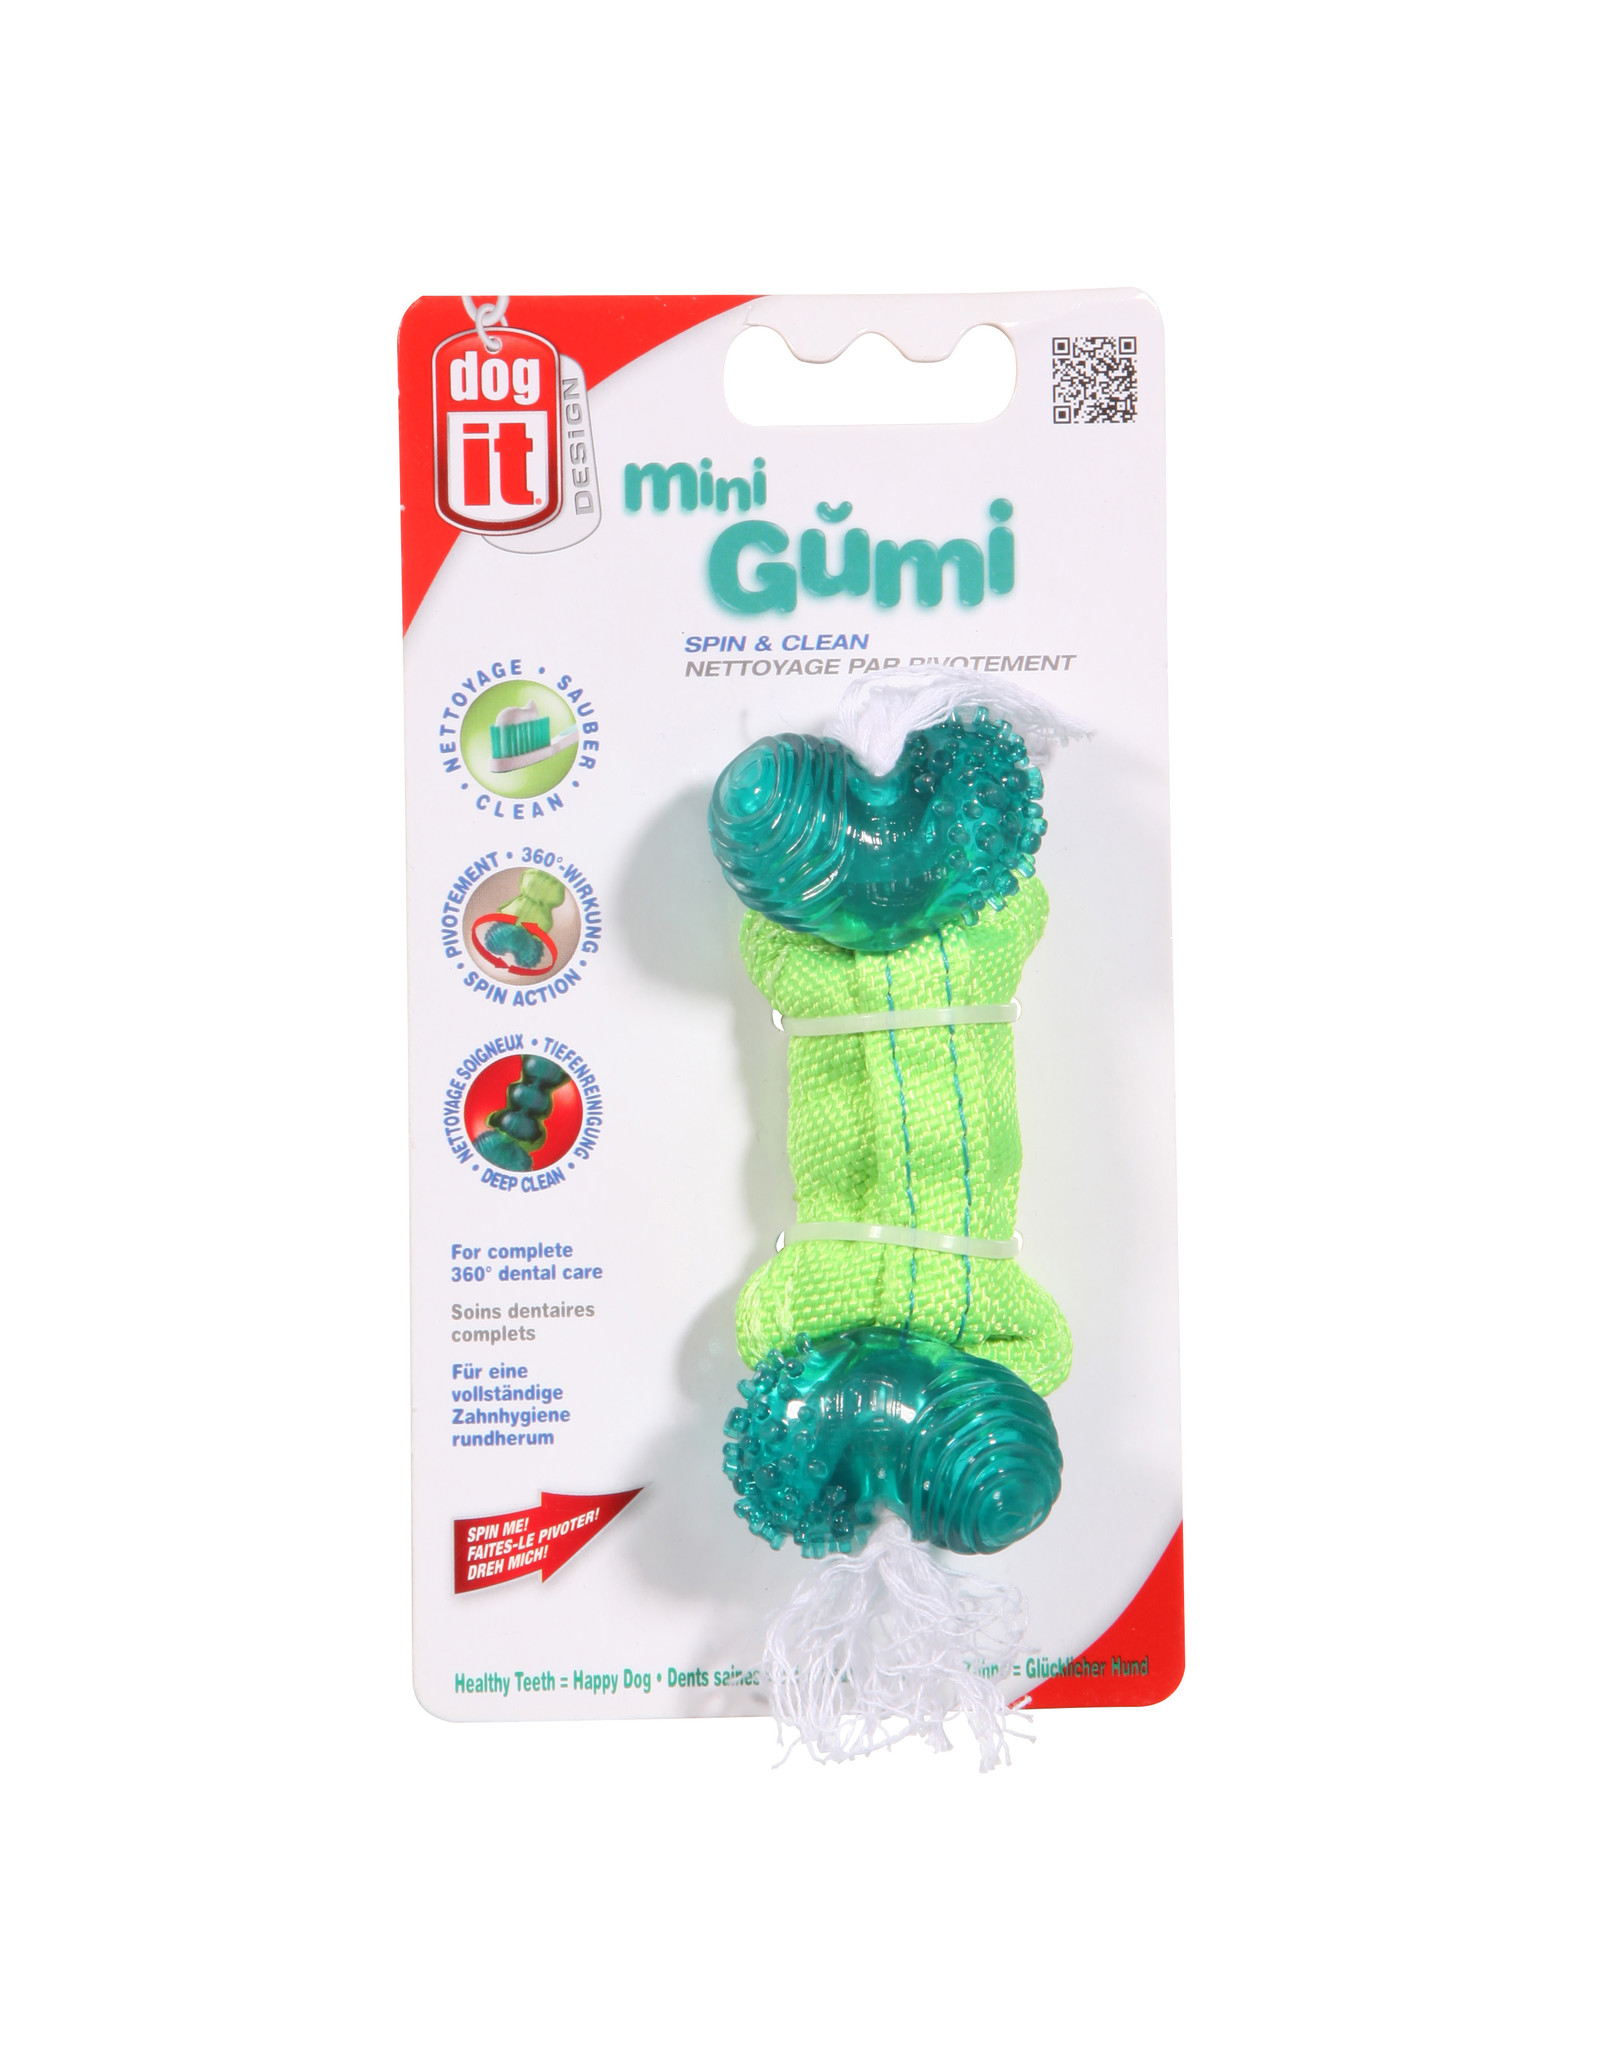 ZS - Zeus Zeus Gumi Dental Dog Toy - Spin & Clean - Mini